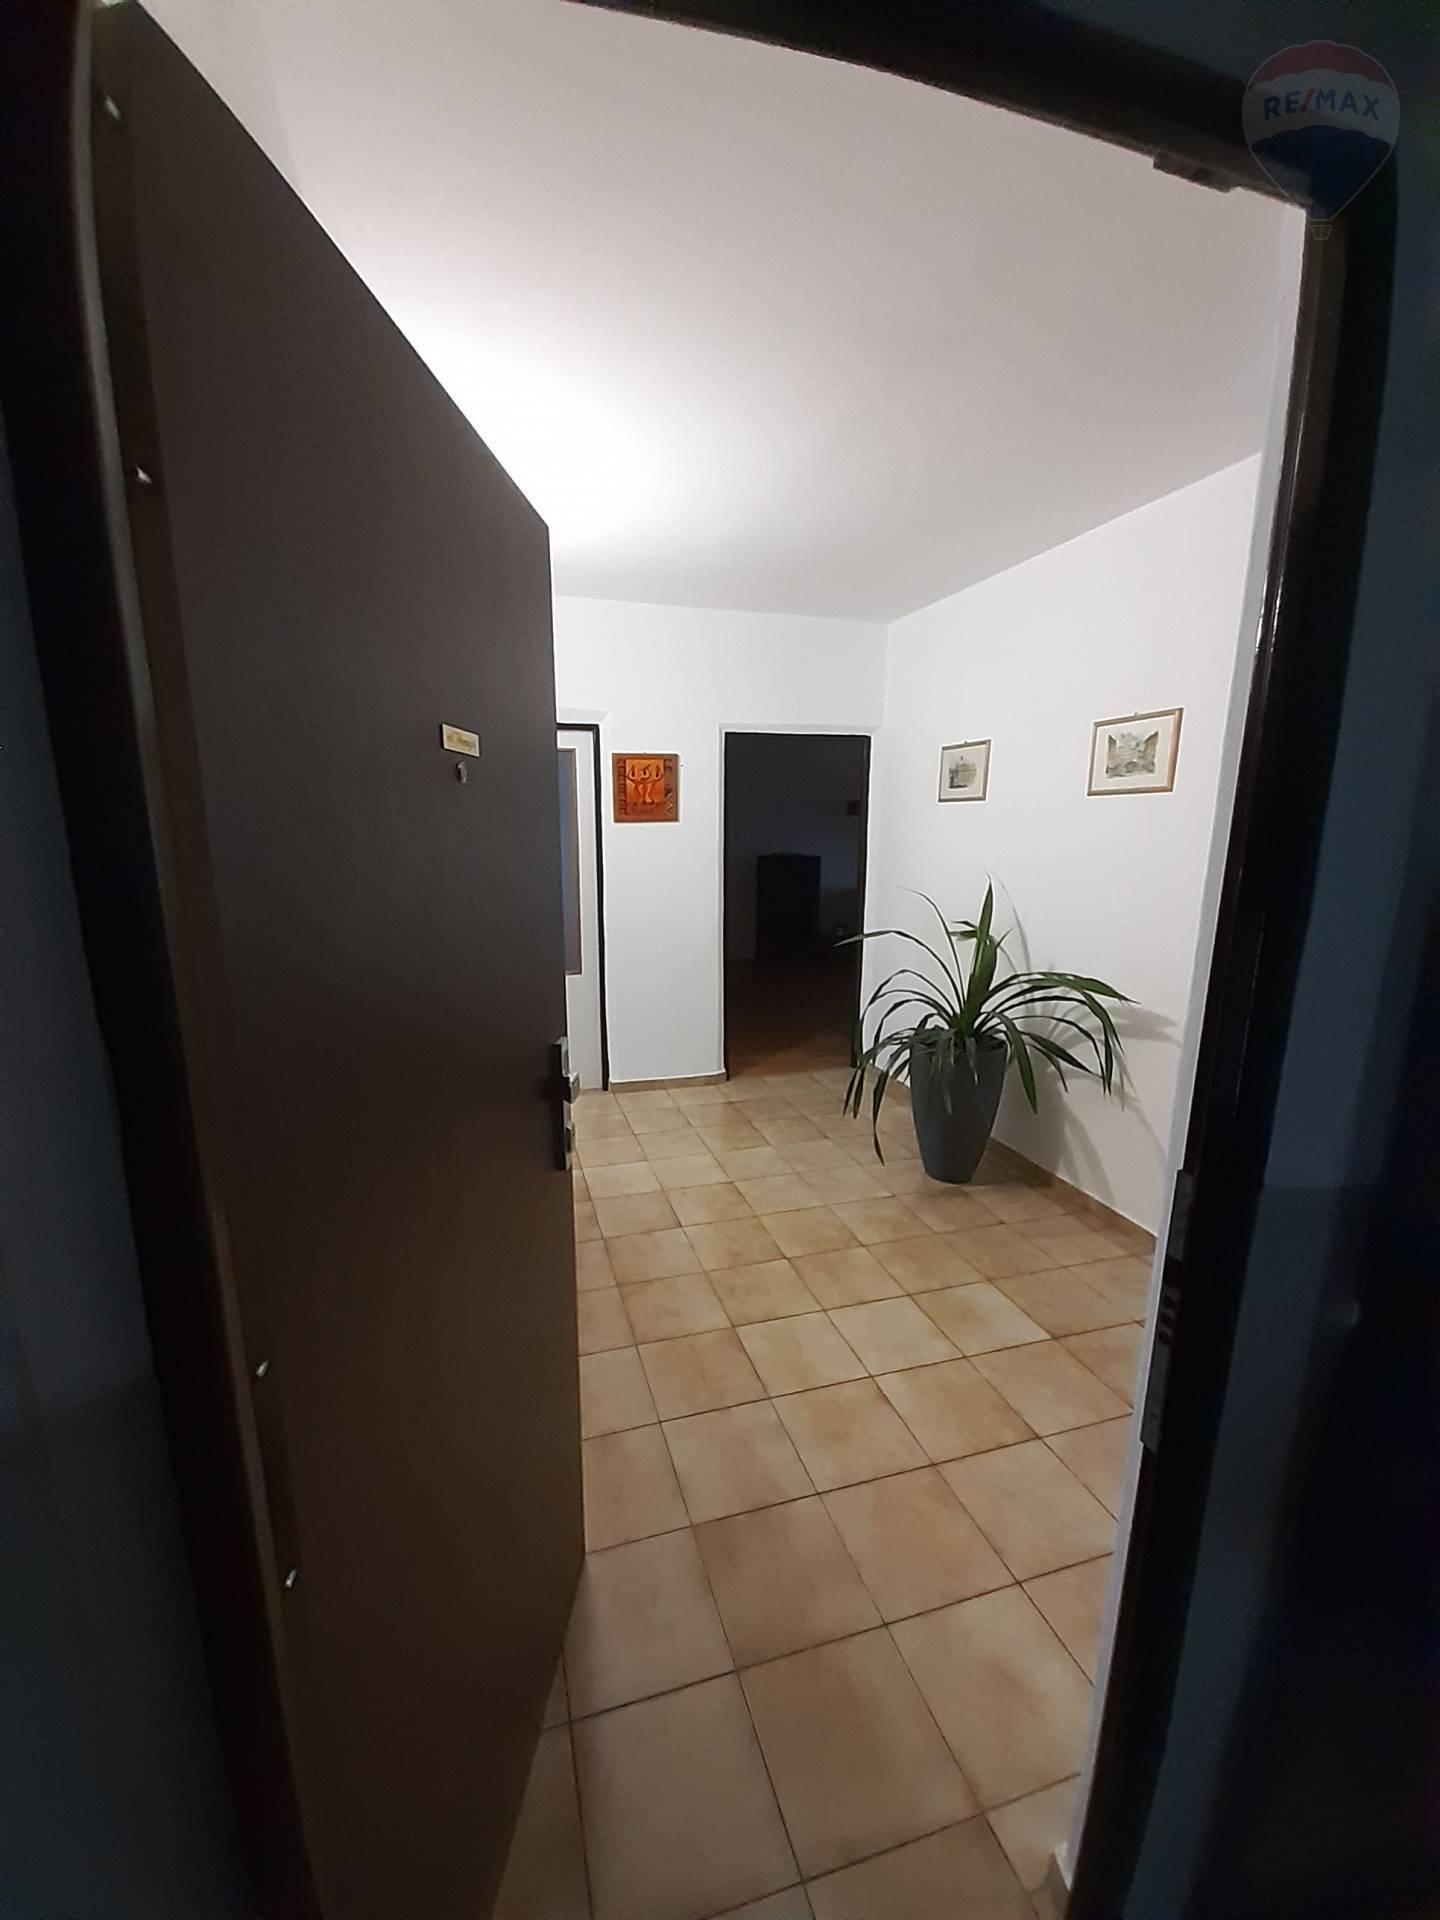 5 izbový byt na predaj v Lučenci